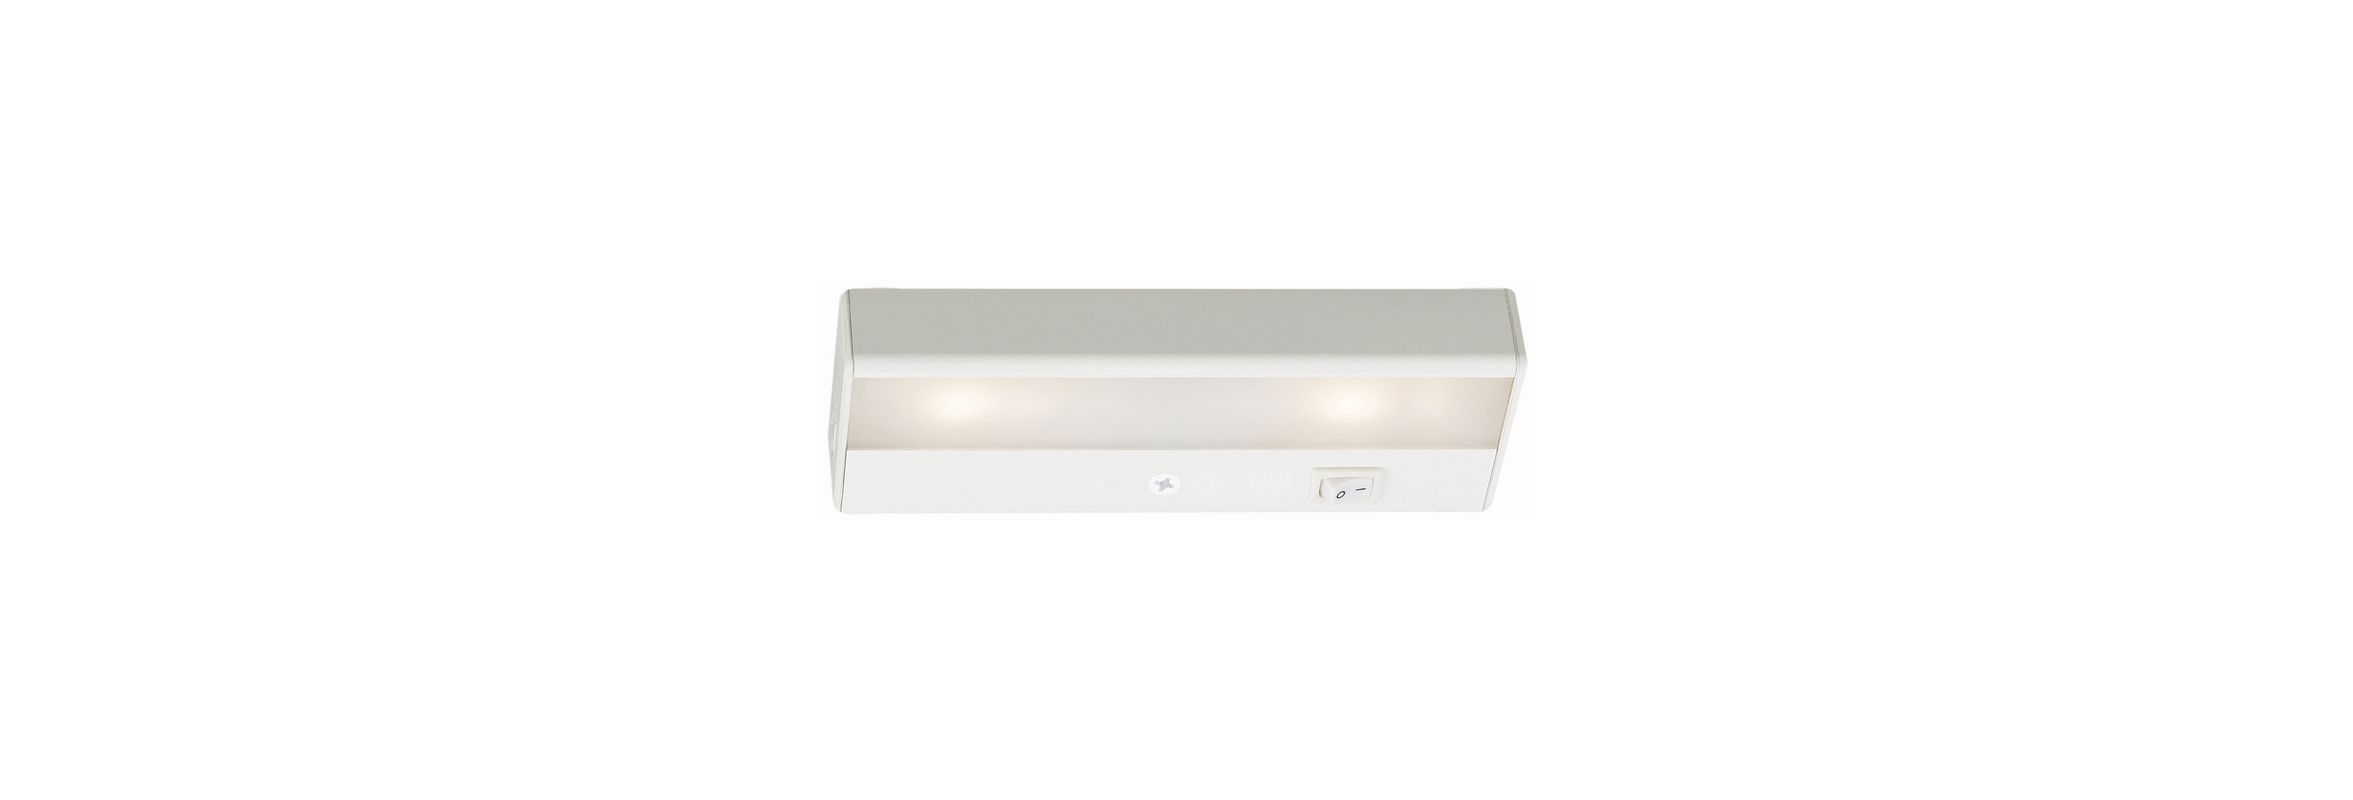 "WAC Lighting BA-LED2-27 8"" Length 2700K High Output LED Under Cabinet"